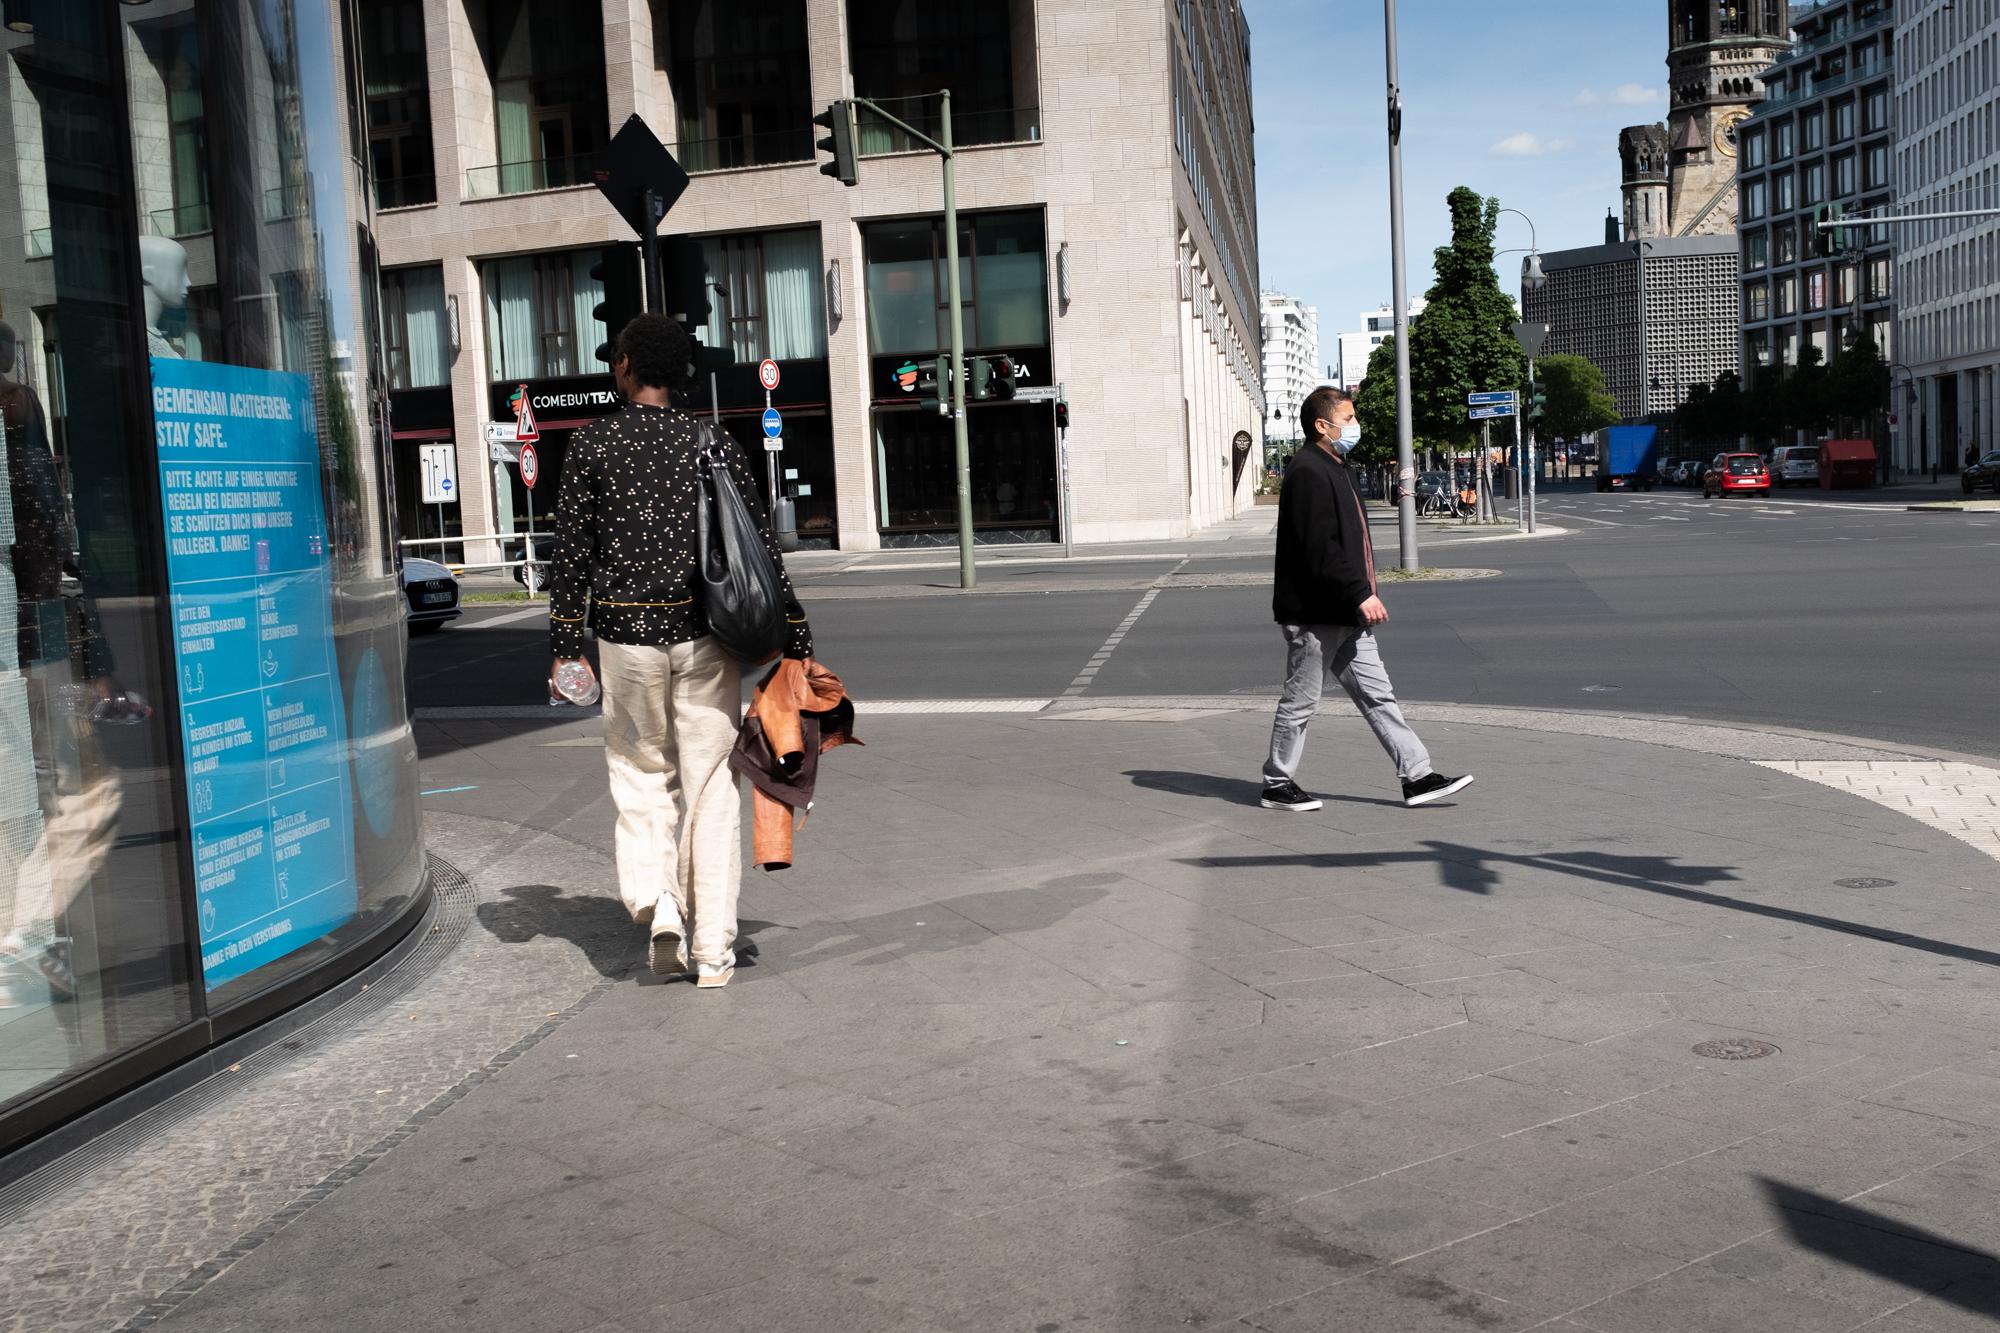 berlin street photography George Lavantsiotis Fujifilm X100F